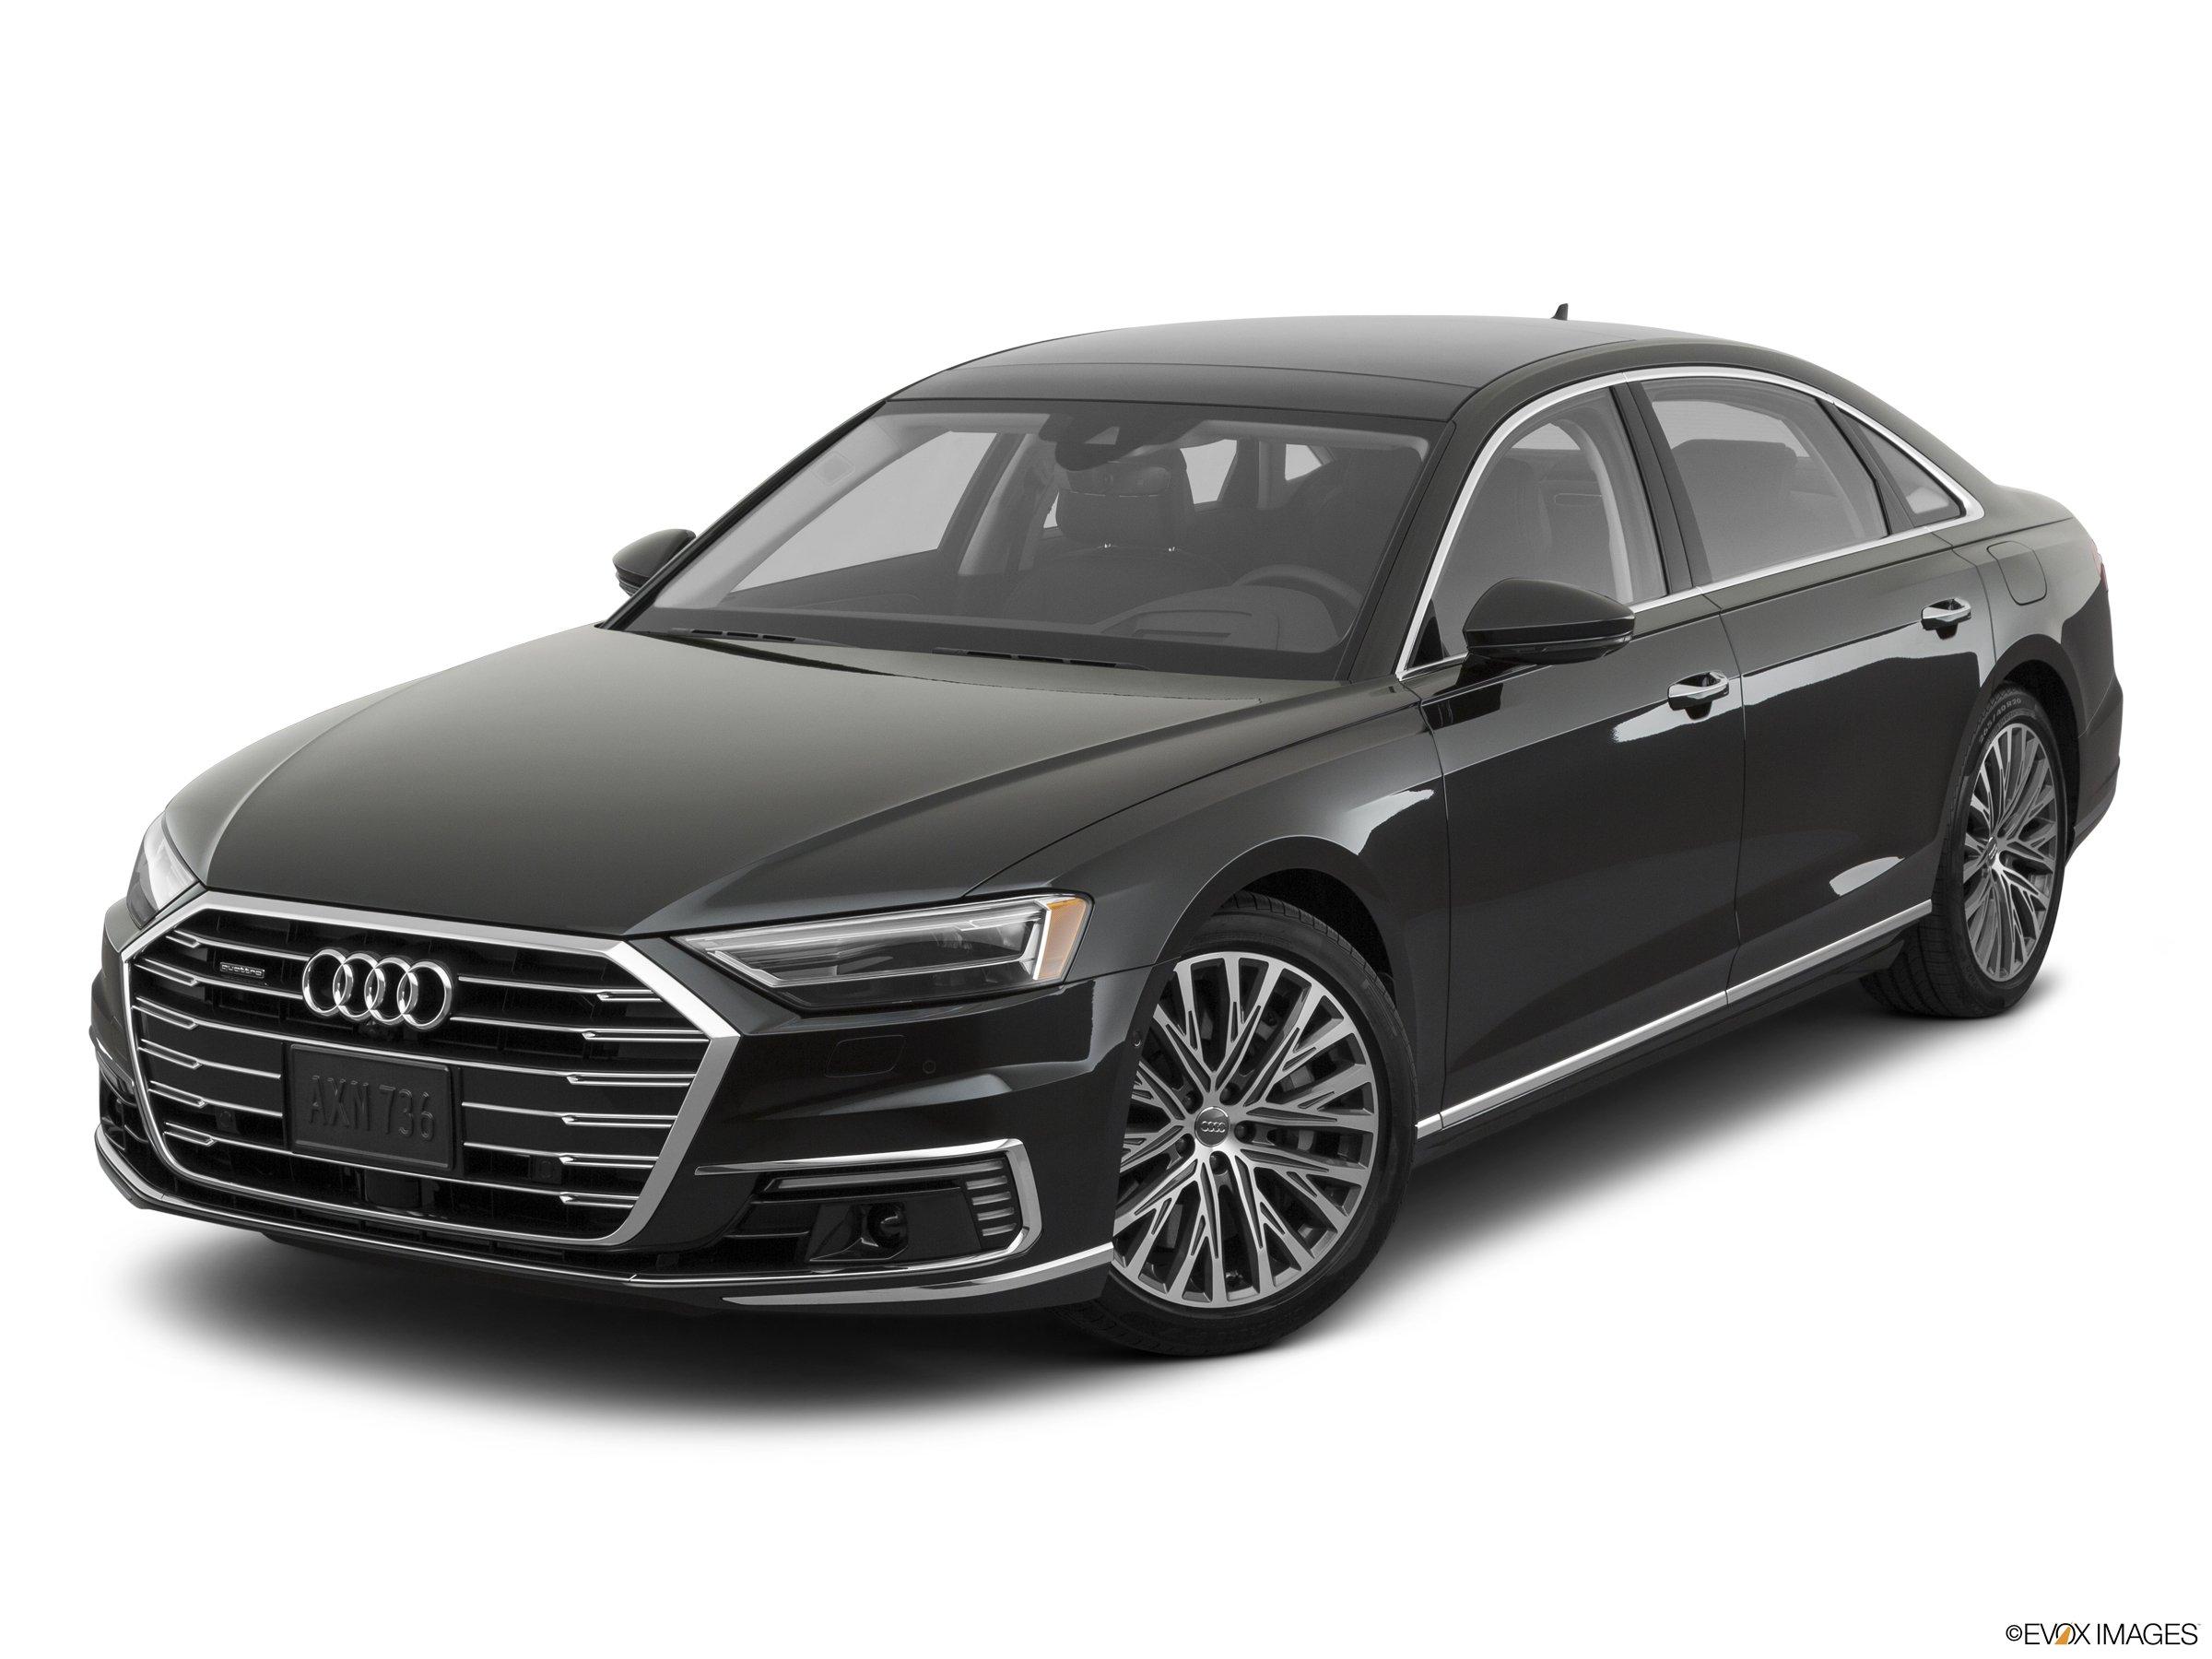 2020 Audi A8 L 60 TFSI e Plug-in hybrid AWD sedan